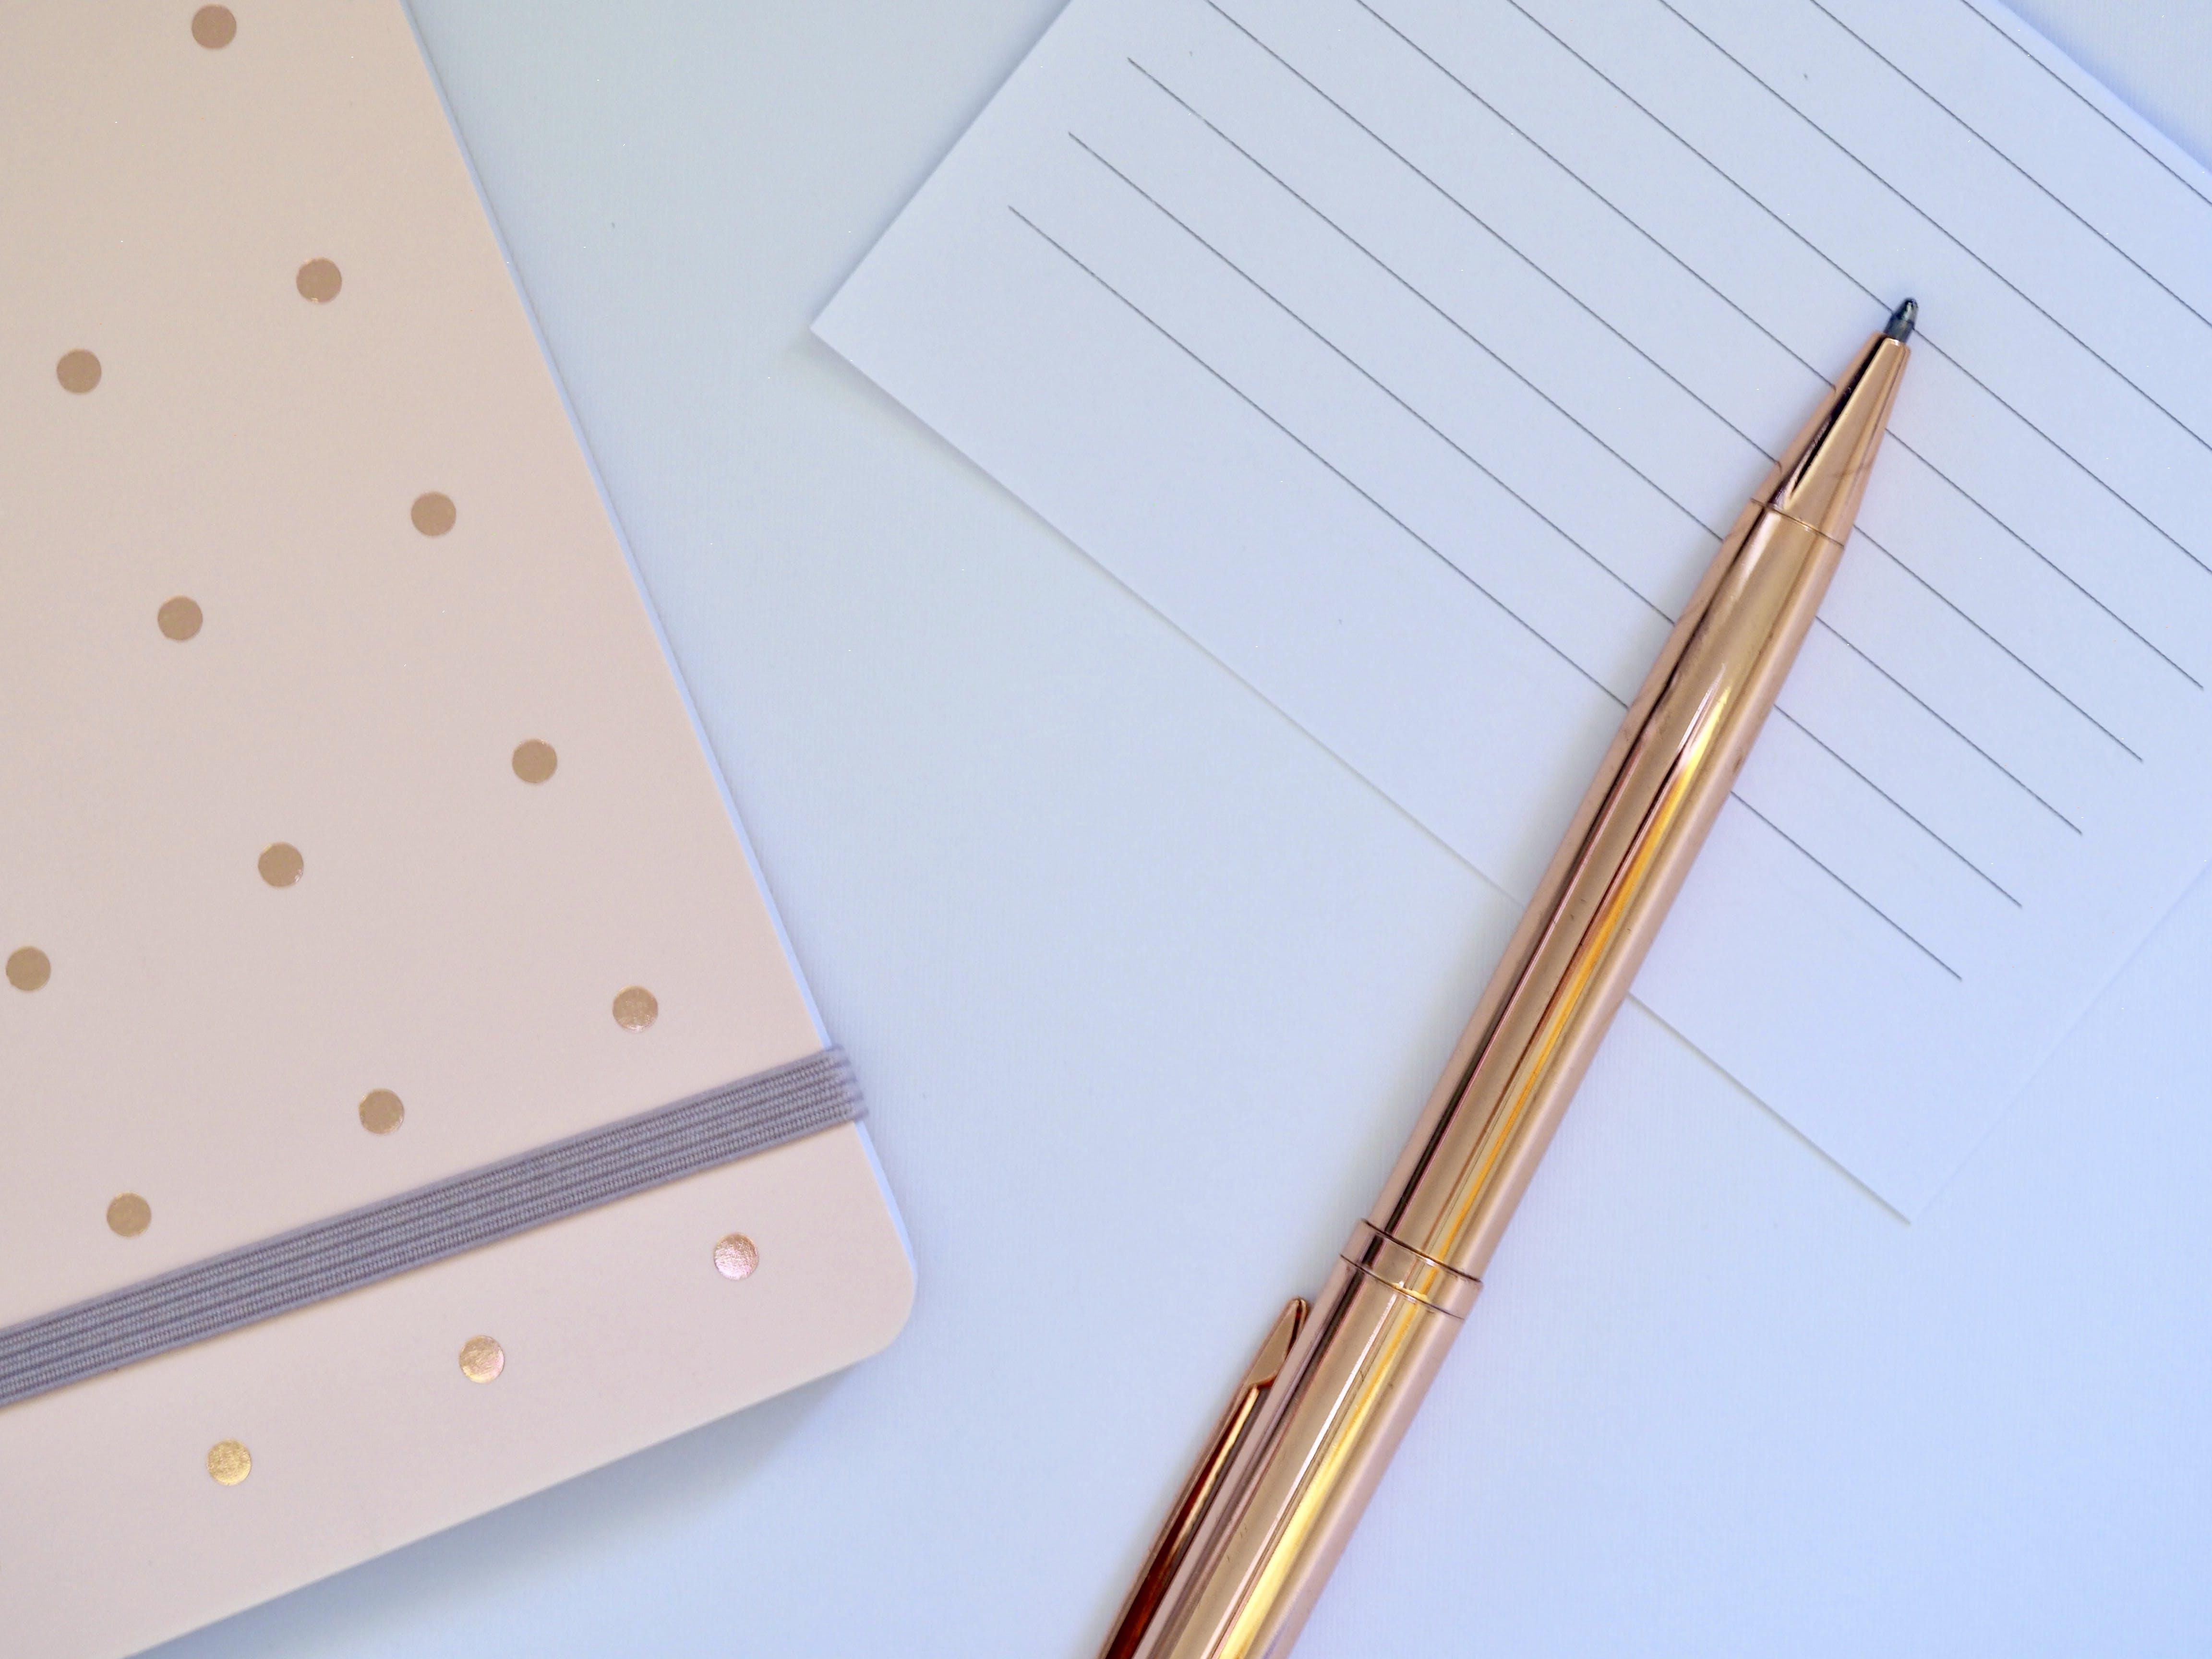 kugelschreiber, leer, notizbuch